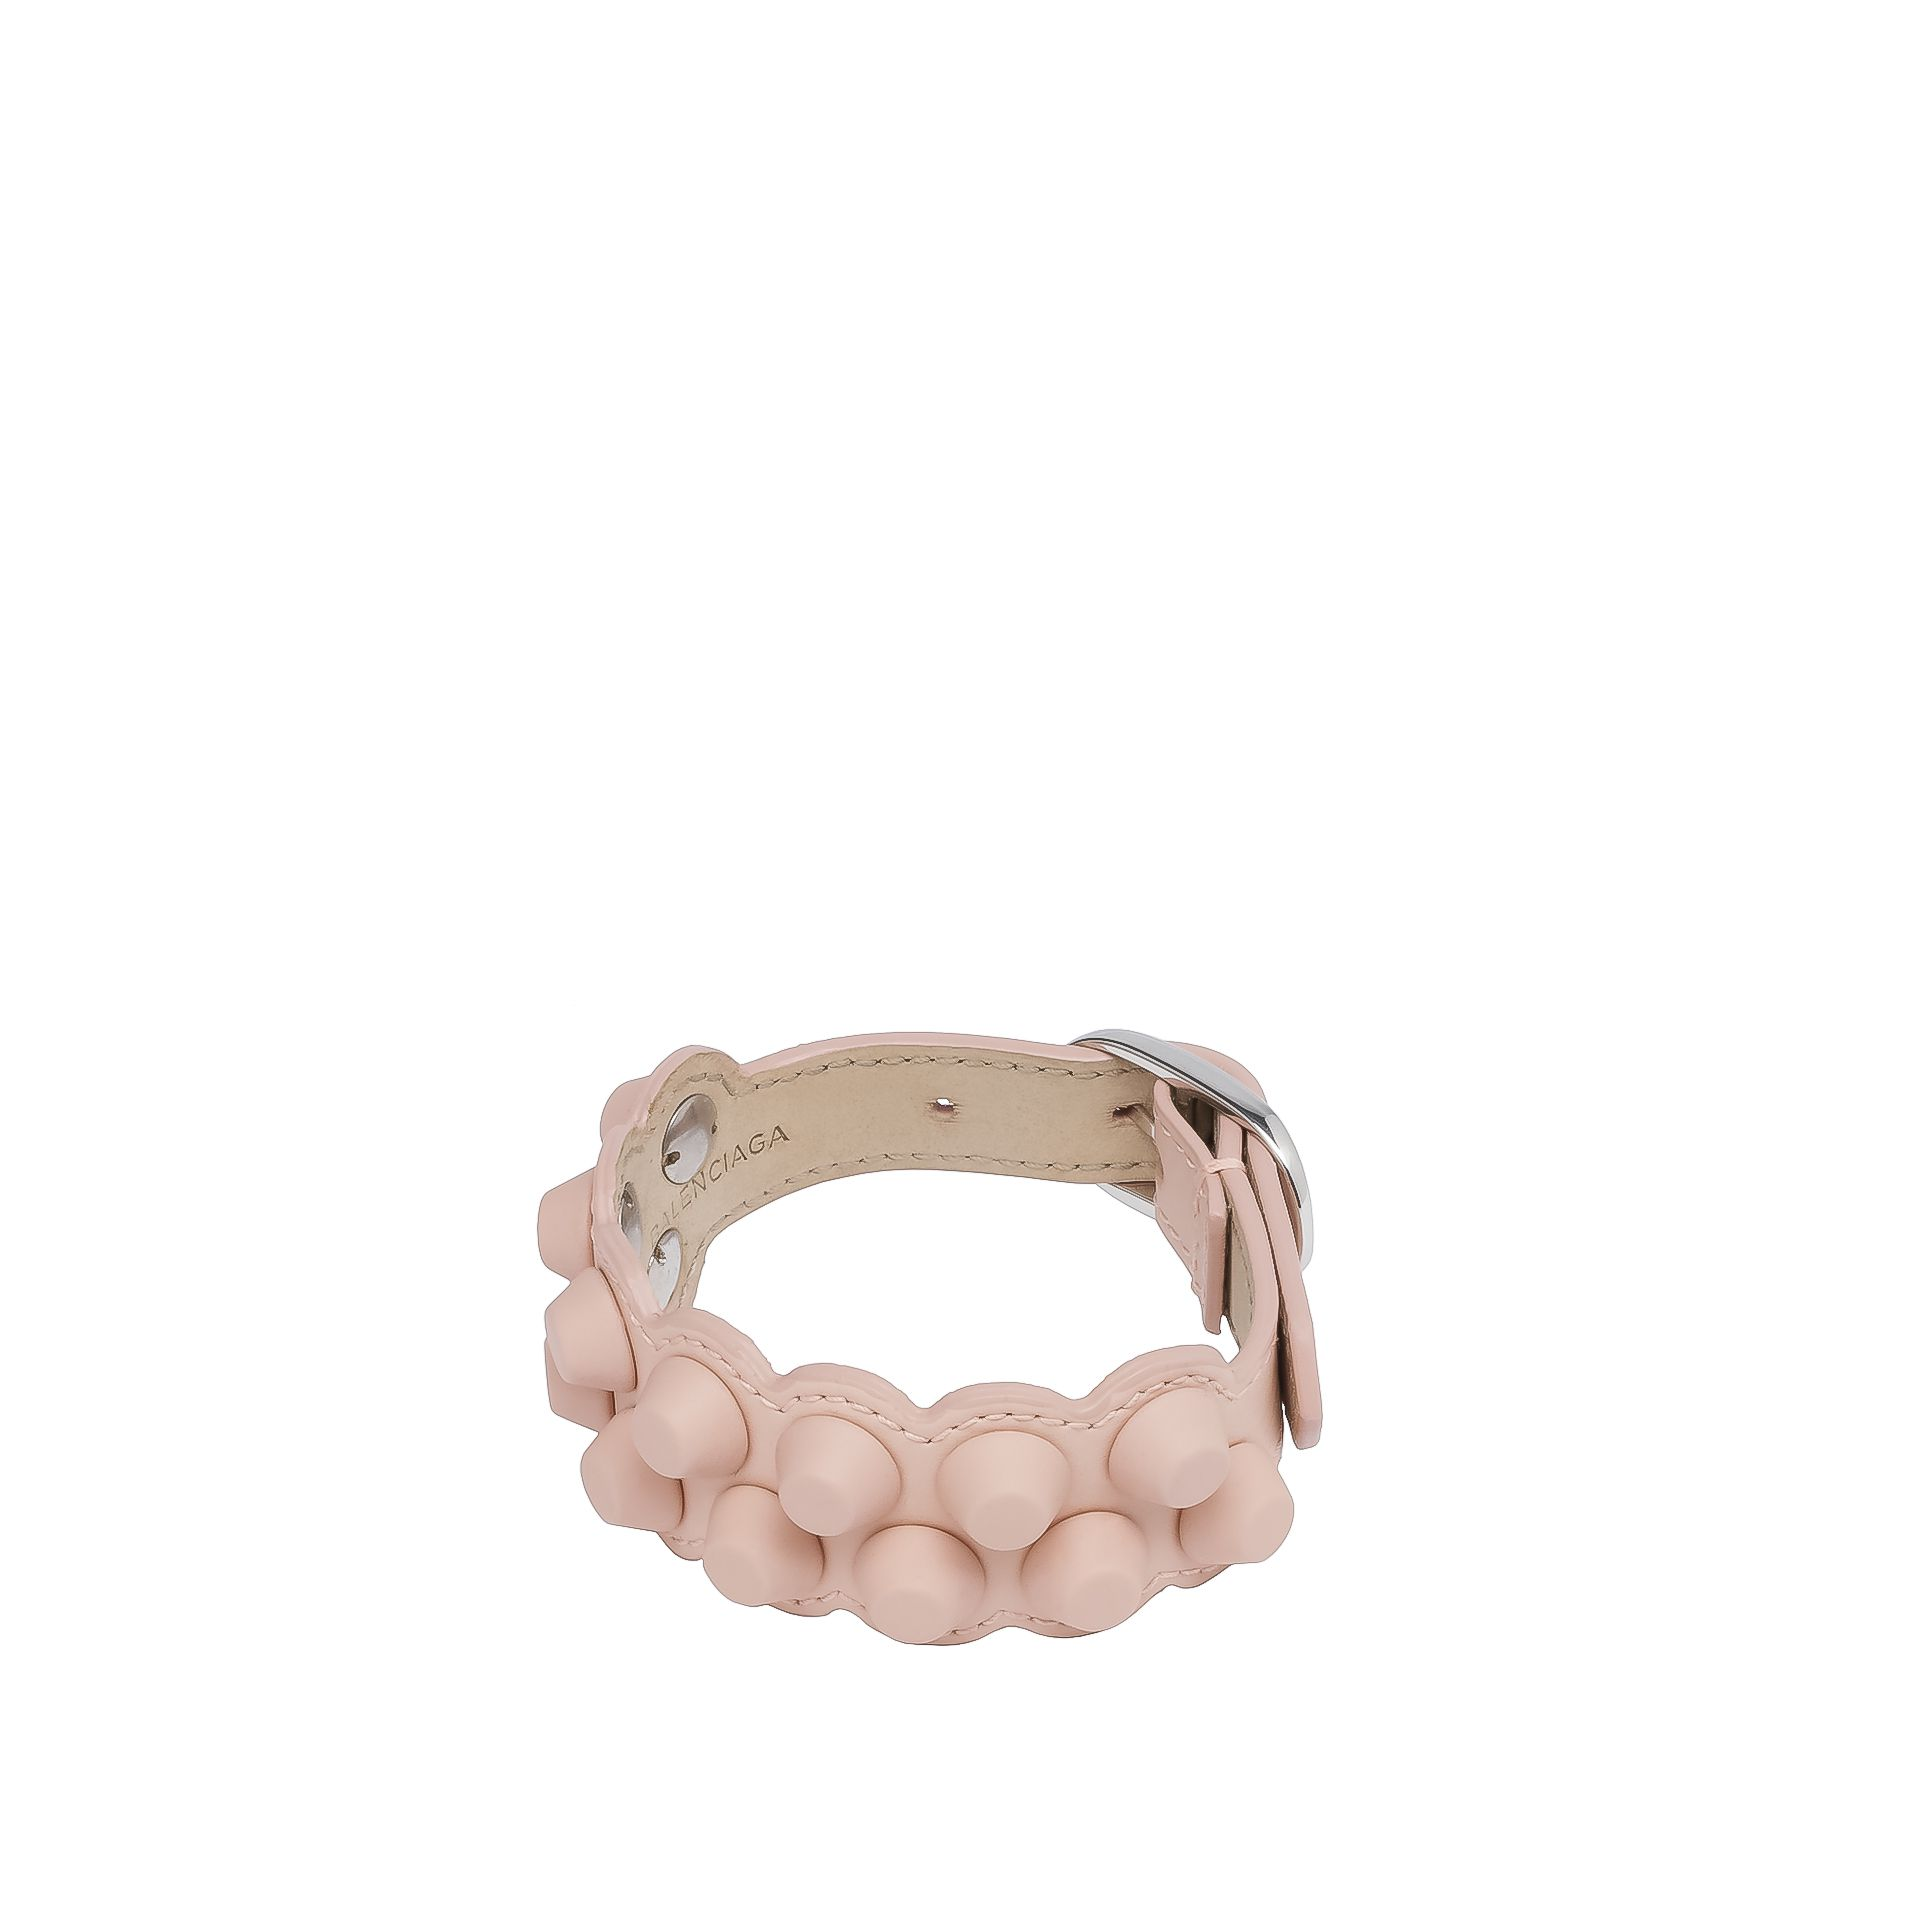 BALENCIAGA Balenciaga Classic Armband Studs M Armband D f